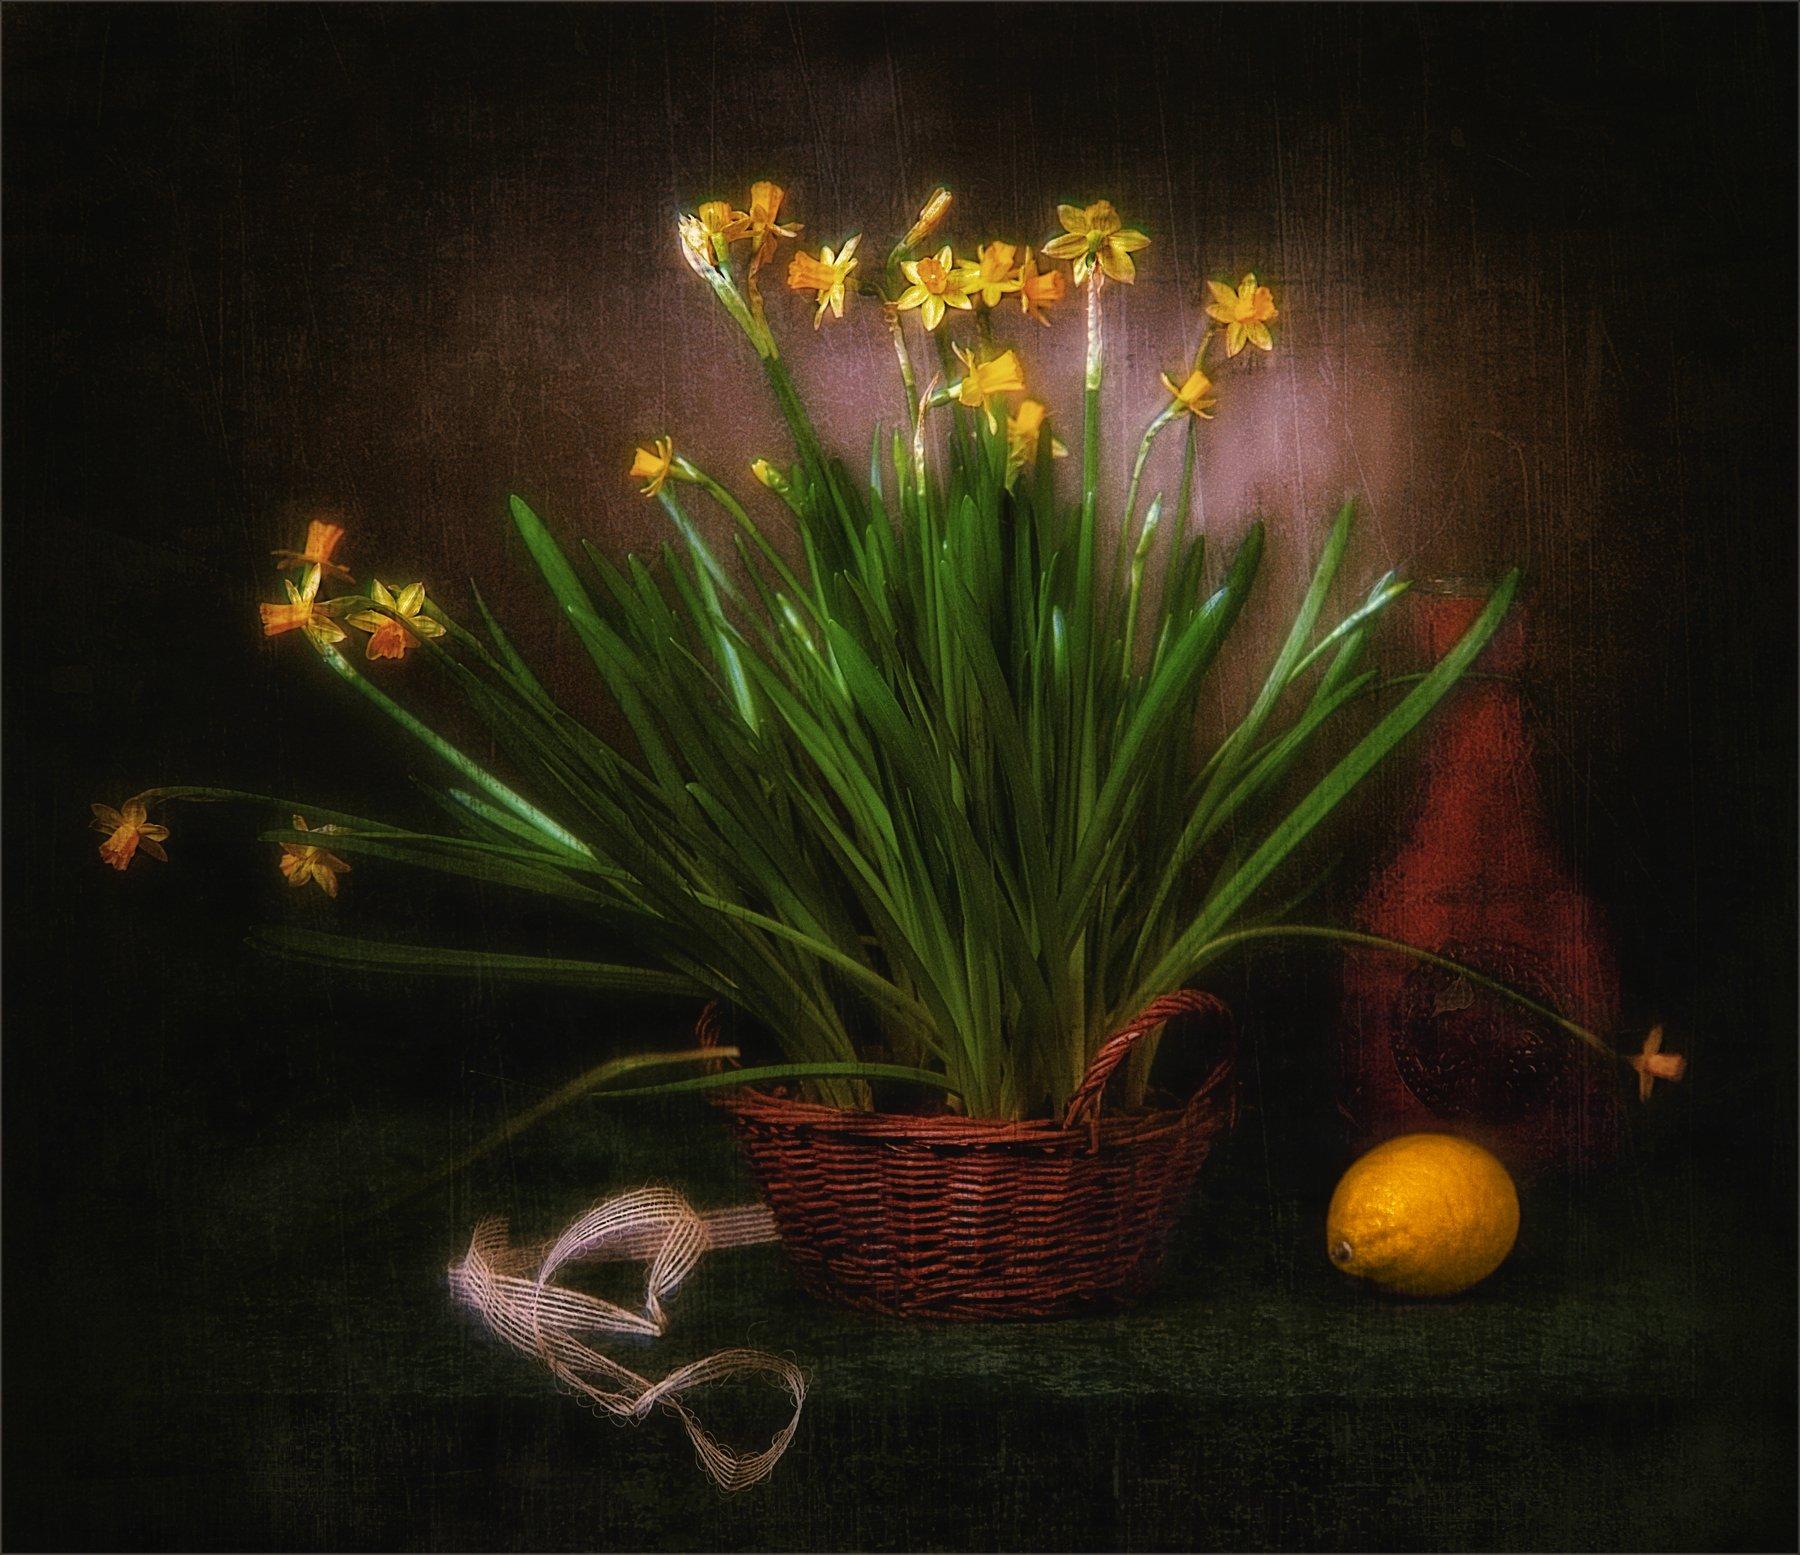 still life, натюрморт, нарциссы, цветы, природа, лимон, бутылка, лента, винтаж, ретро, стилизация, корзинка, Михаил MSH